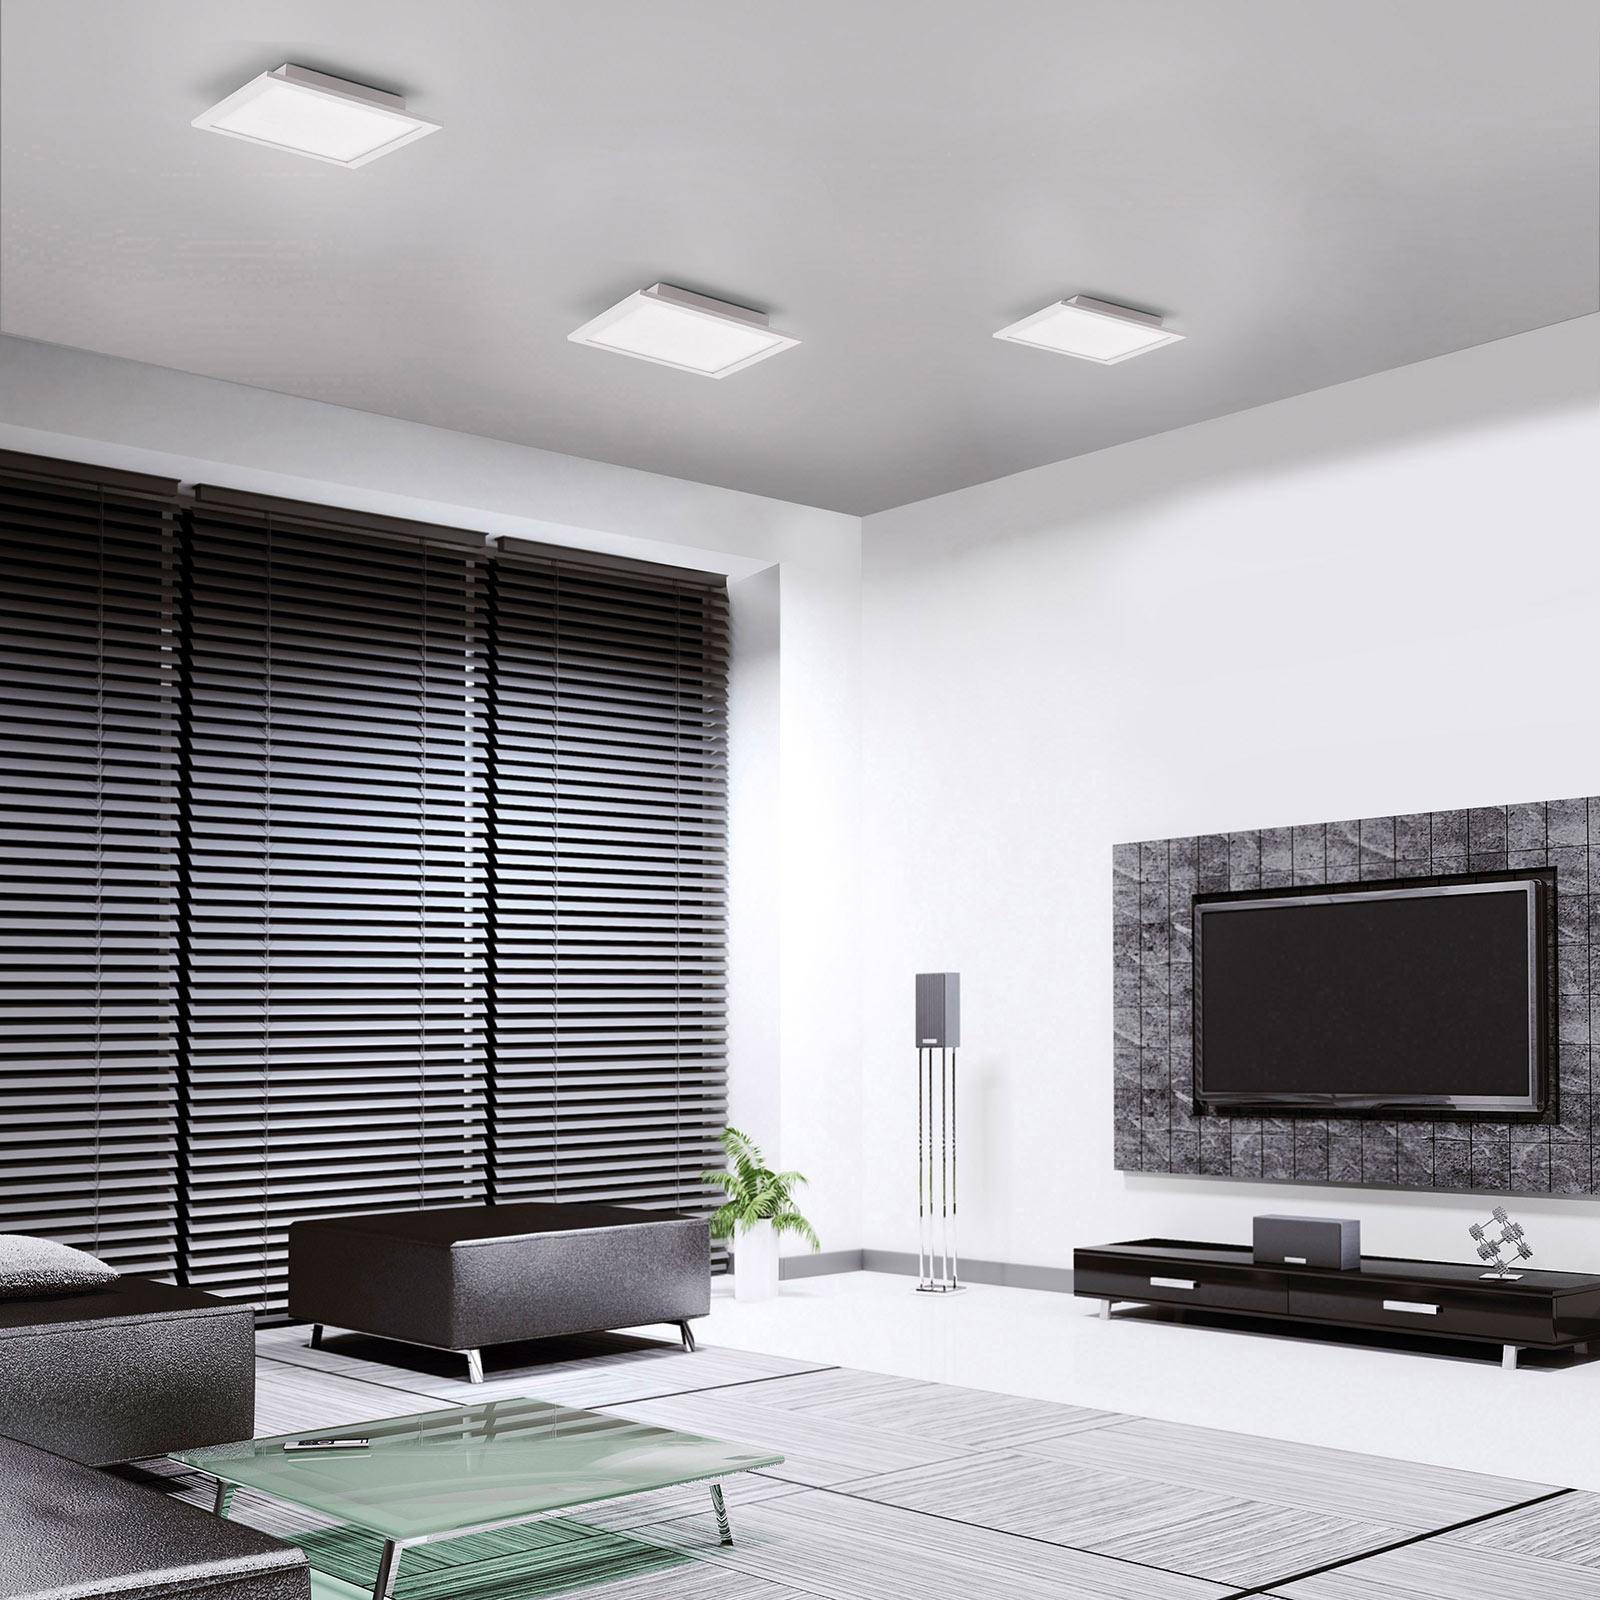 LED-Deckenleuchte LOLAsmart Flat, 30 x 30 cm